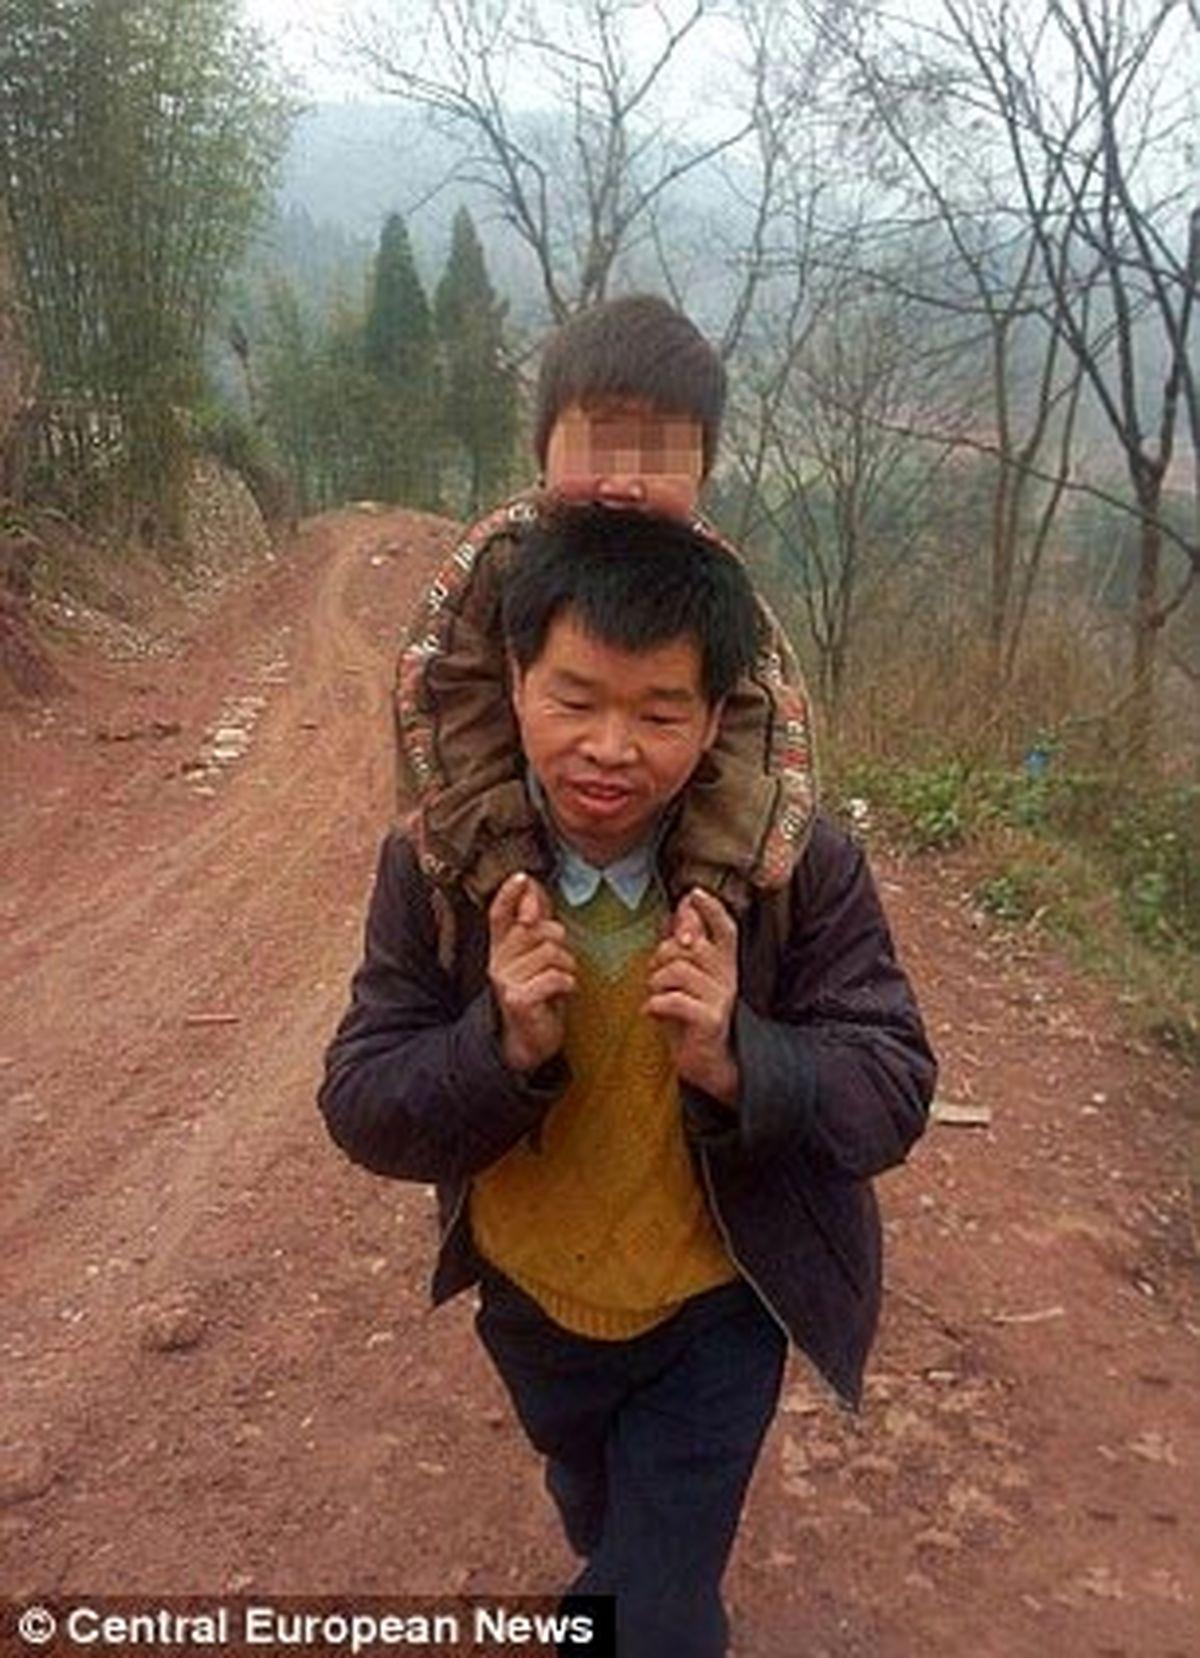 فداکارترین پدر دنیا/عکس